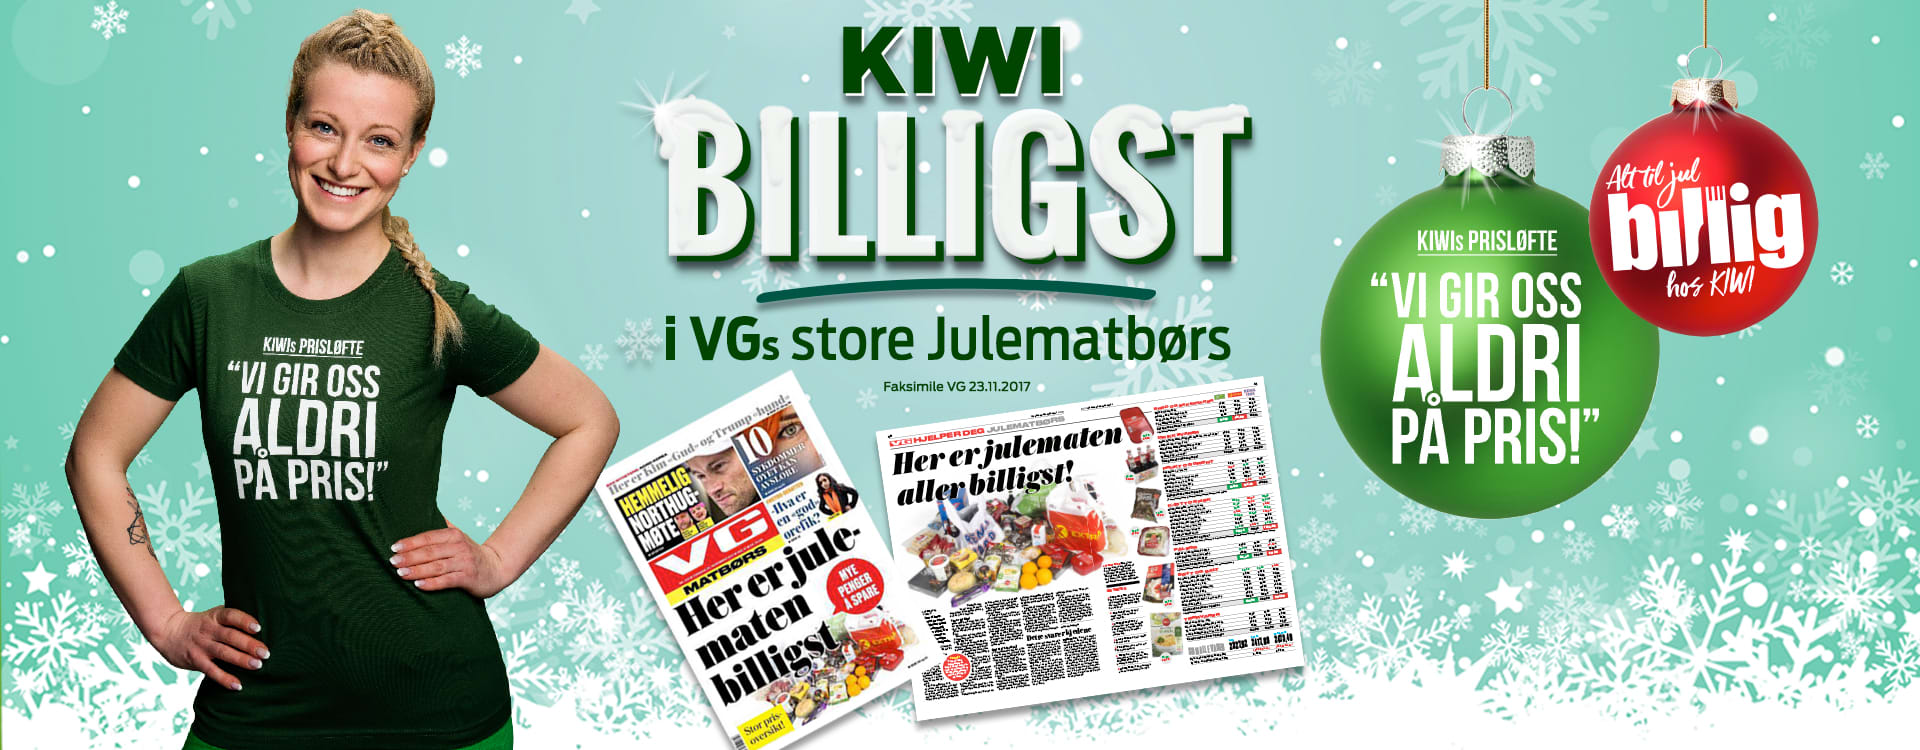 KIWI var suverent billigst i VGs julematbørs 23.11.17 med en handlekurv på 2328 kr som var 90 og 146 kr billigere enn konkurrentene.